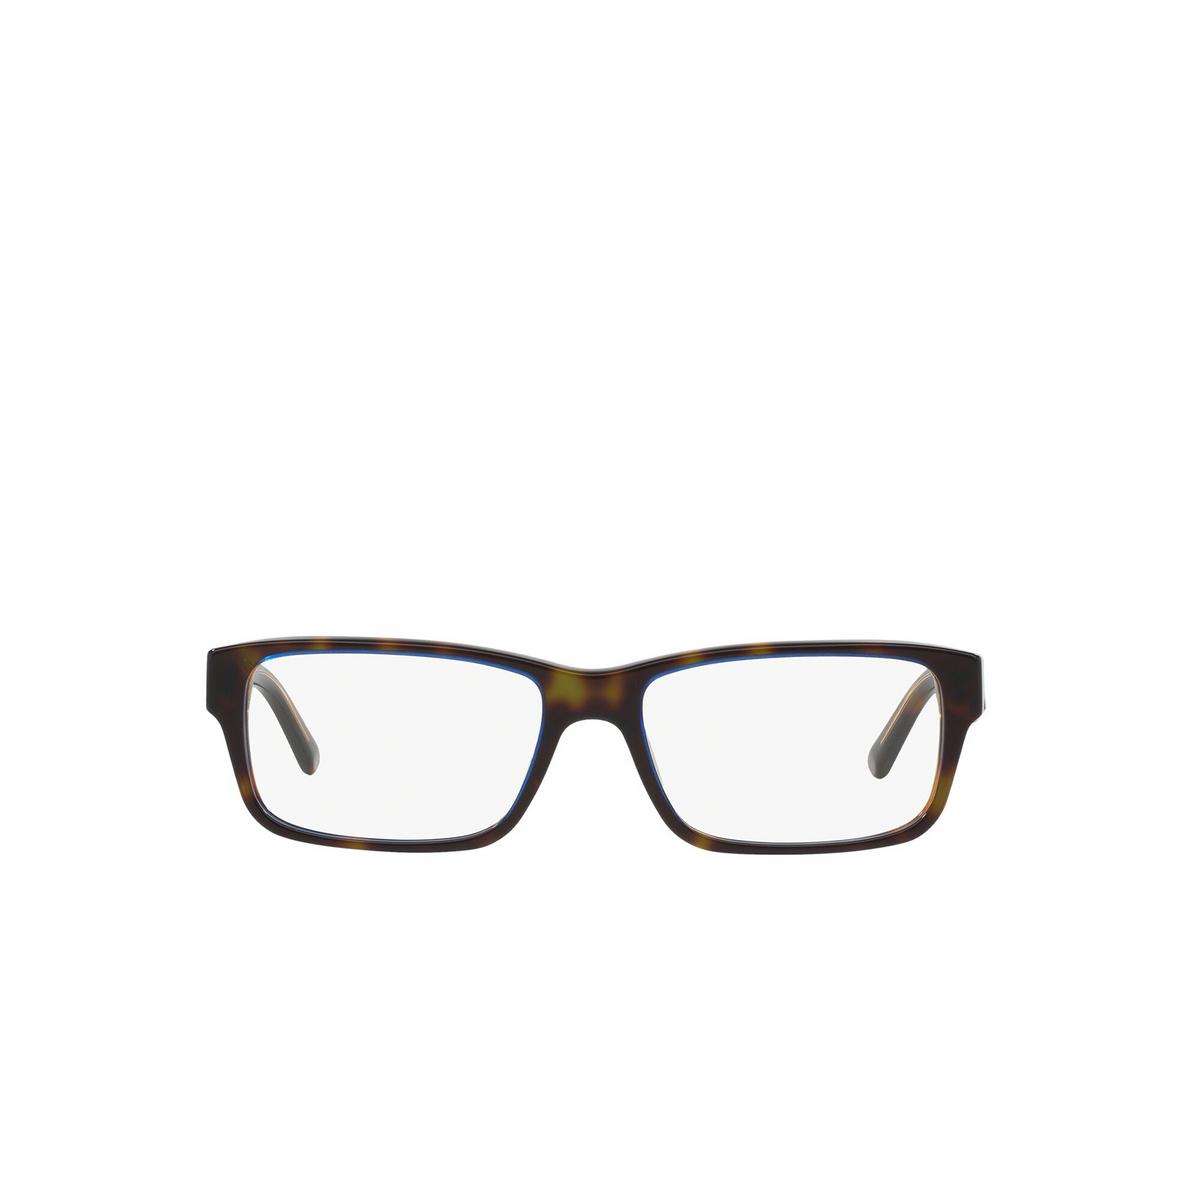 Prada® Rectangle Eyeglasses: Heritage PR 16MV color Tortoise Denim ZXH1O1 - front view.